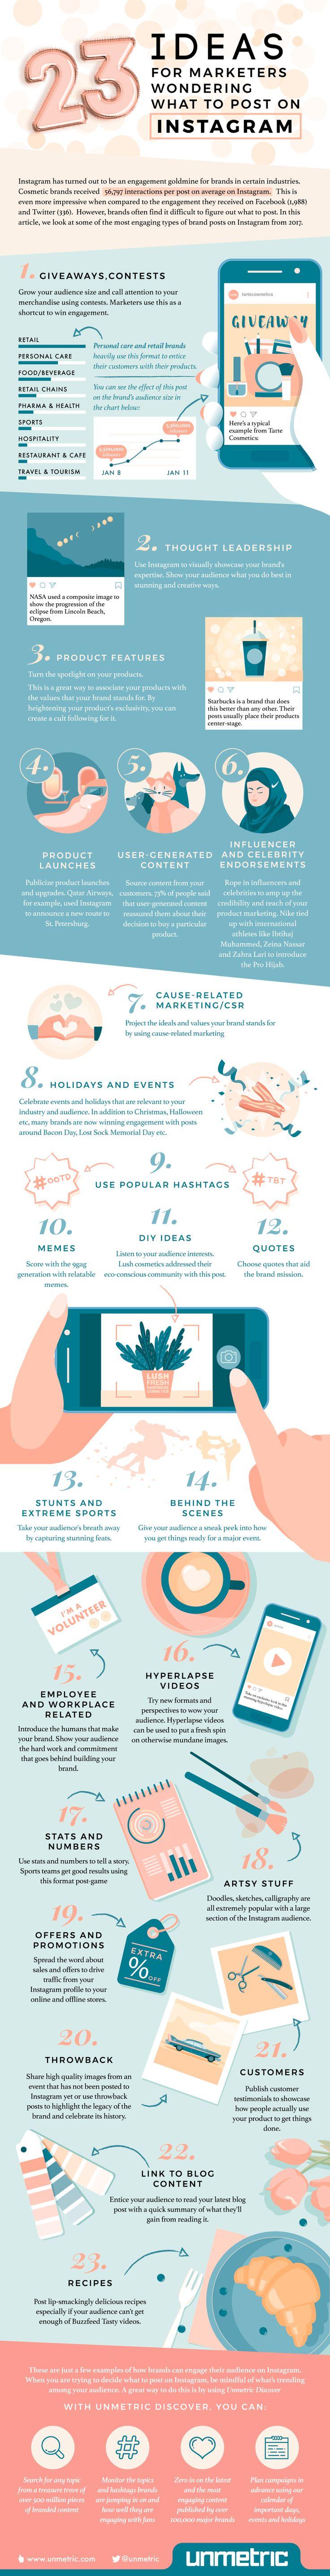 49 besten Social Media Bilder auf Pinterest